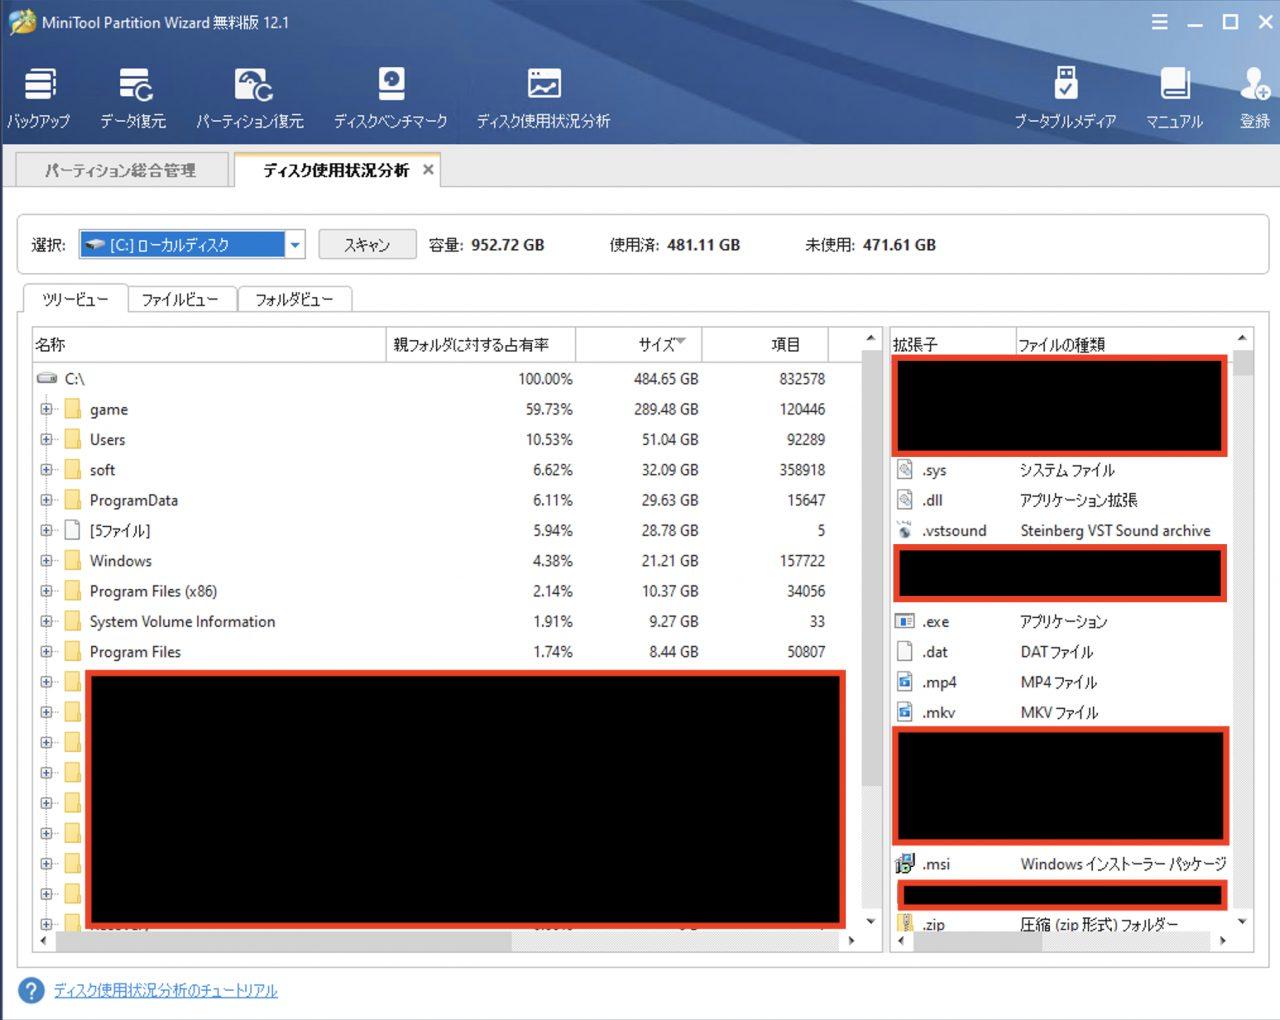 MiniTool Partition Wizard  ディスク使用状況分析の結果